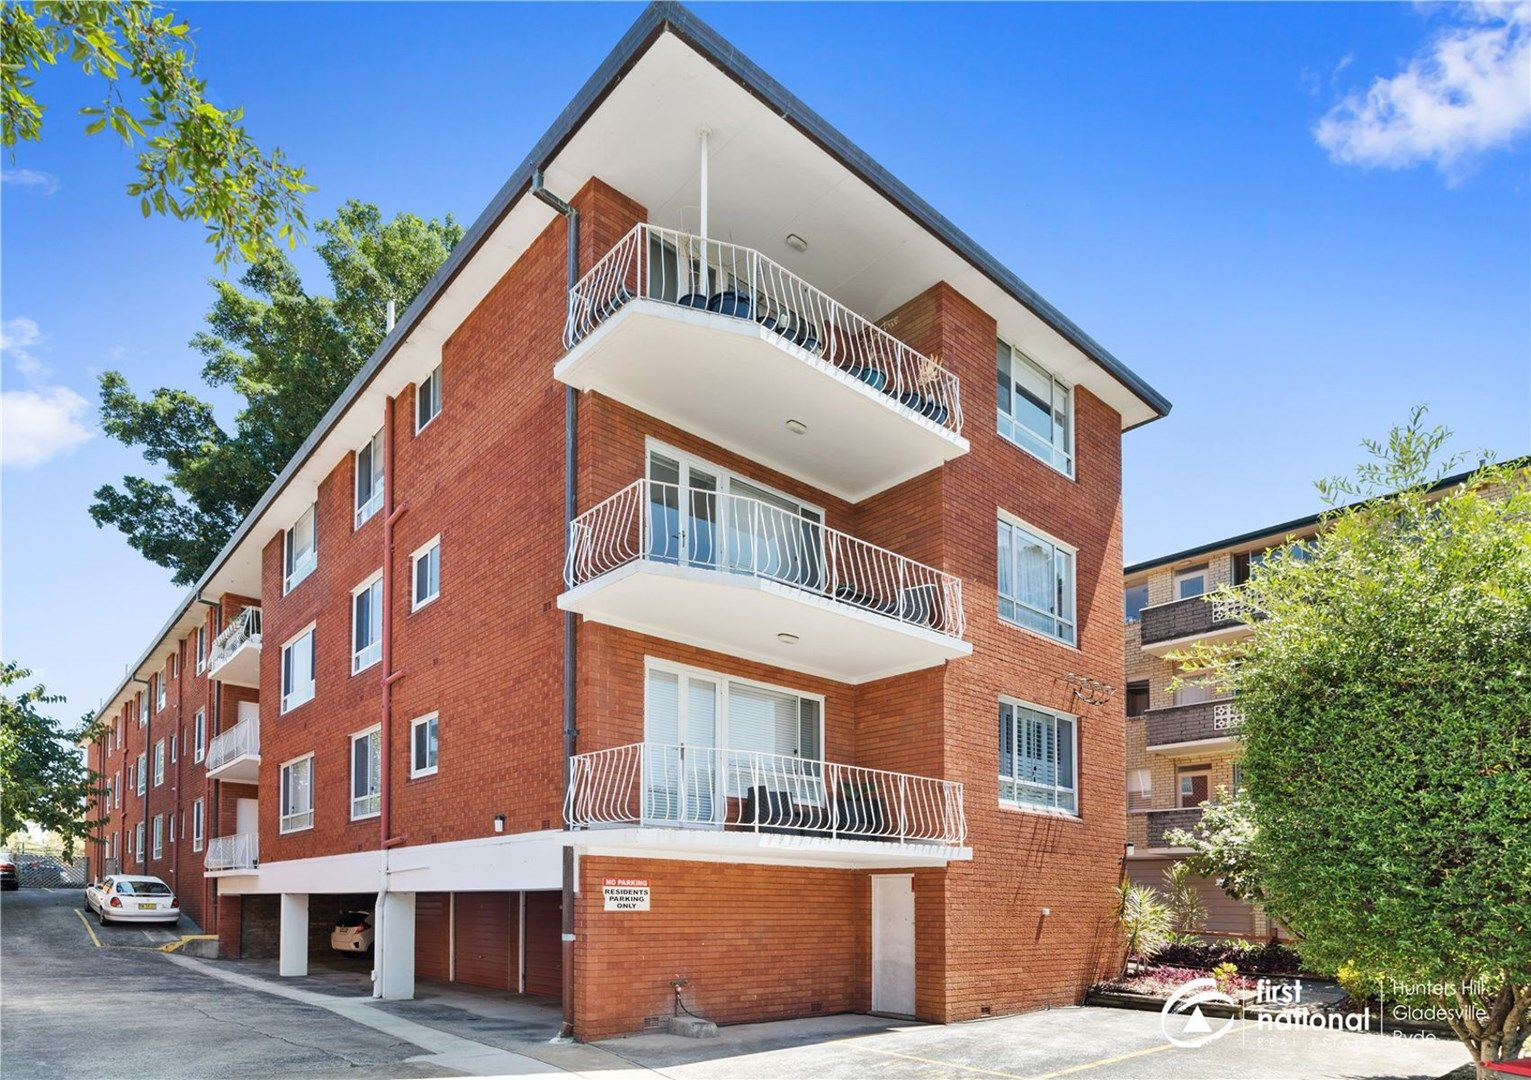 3/27 Wharf Road, Gladesville NSW 2111, Image 0